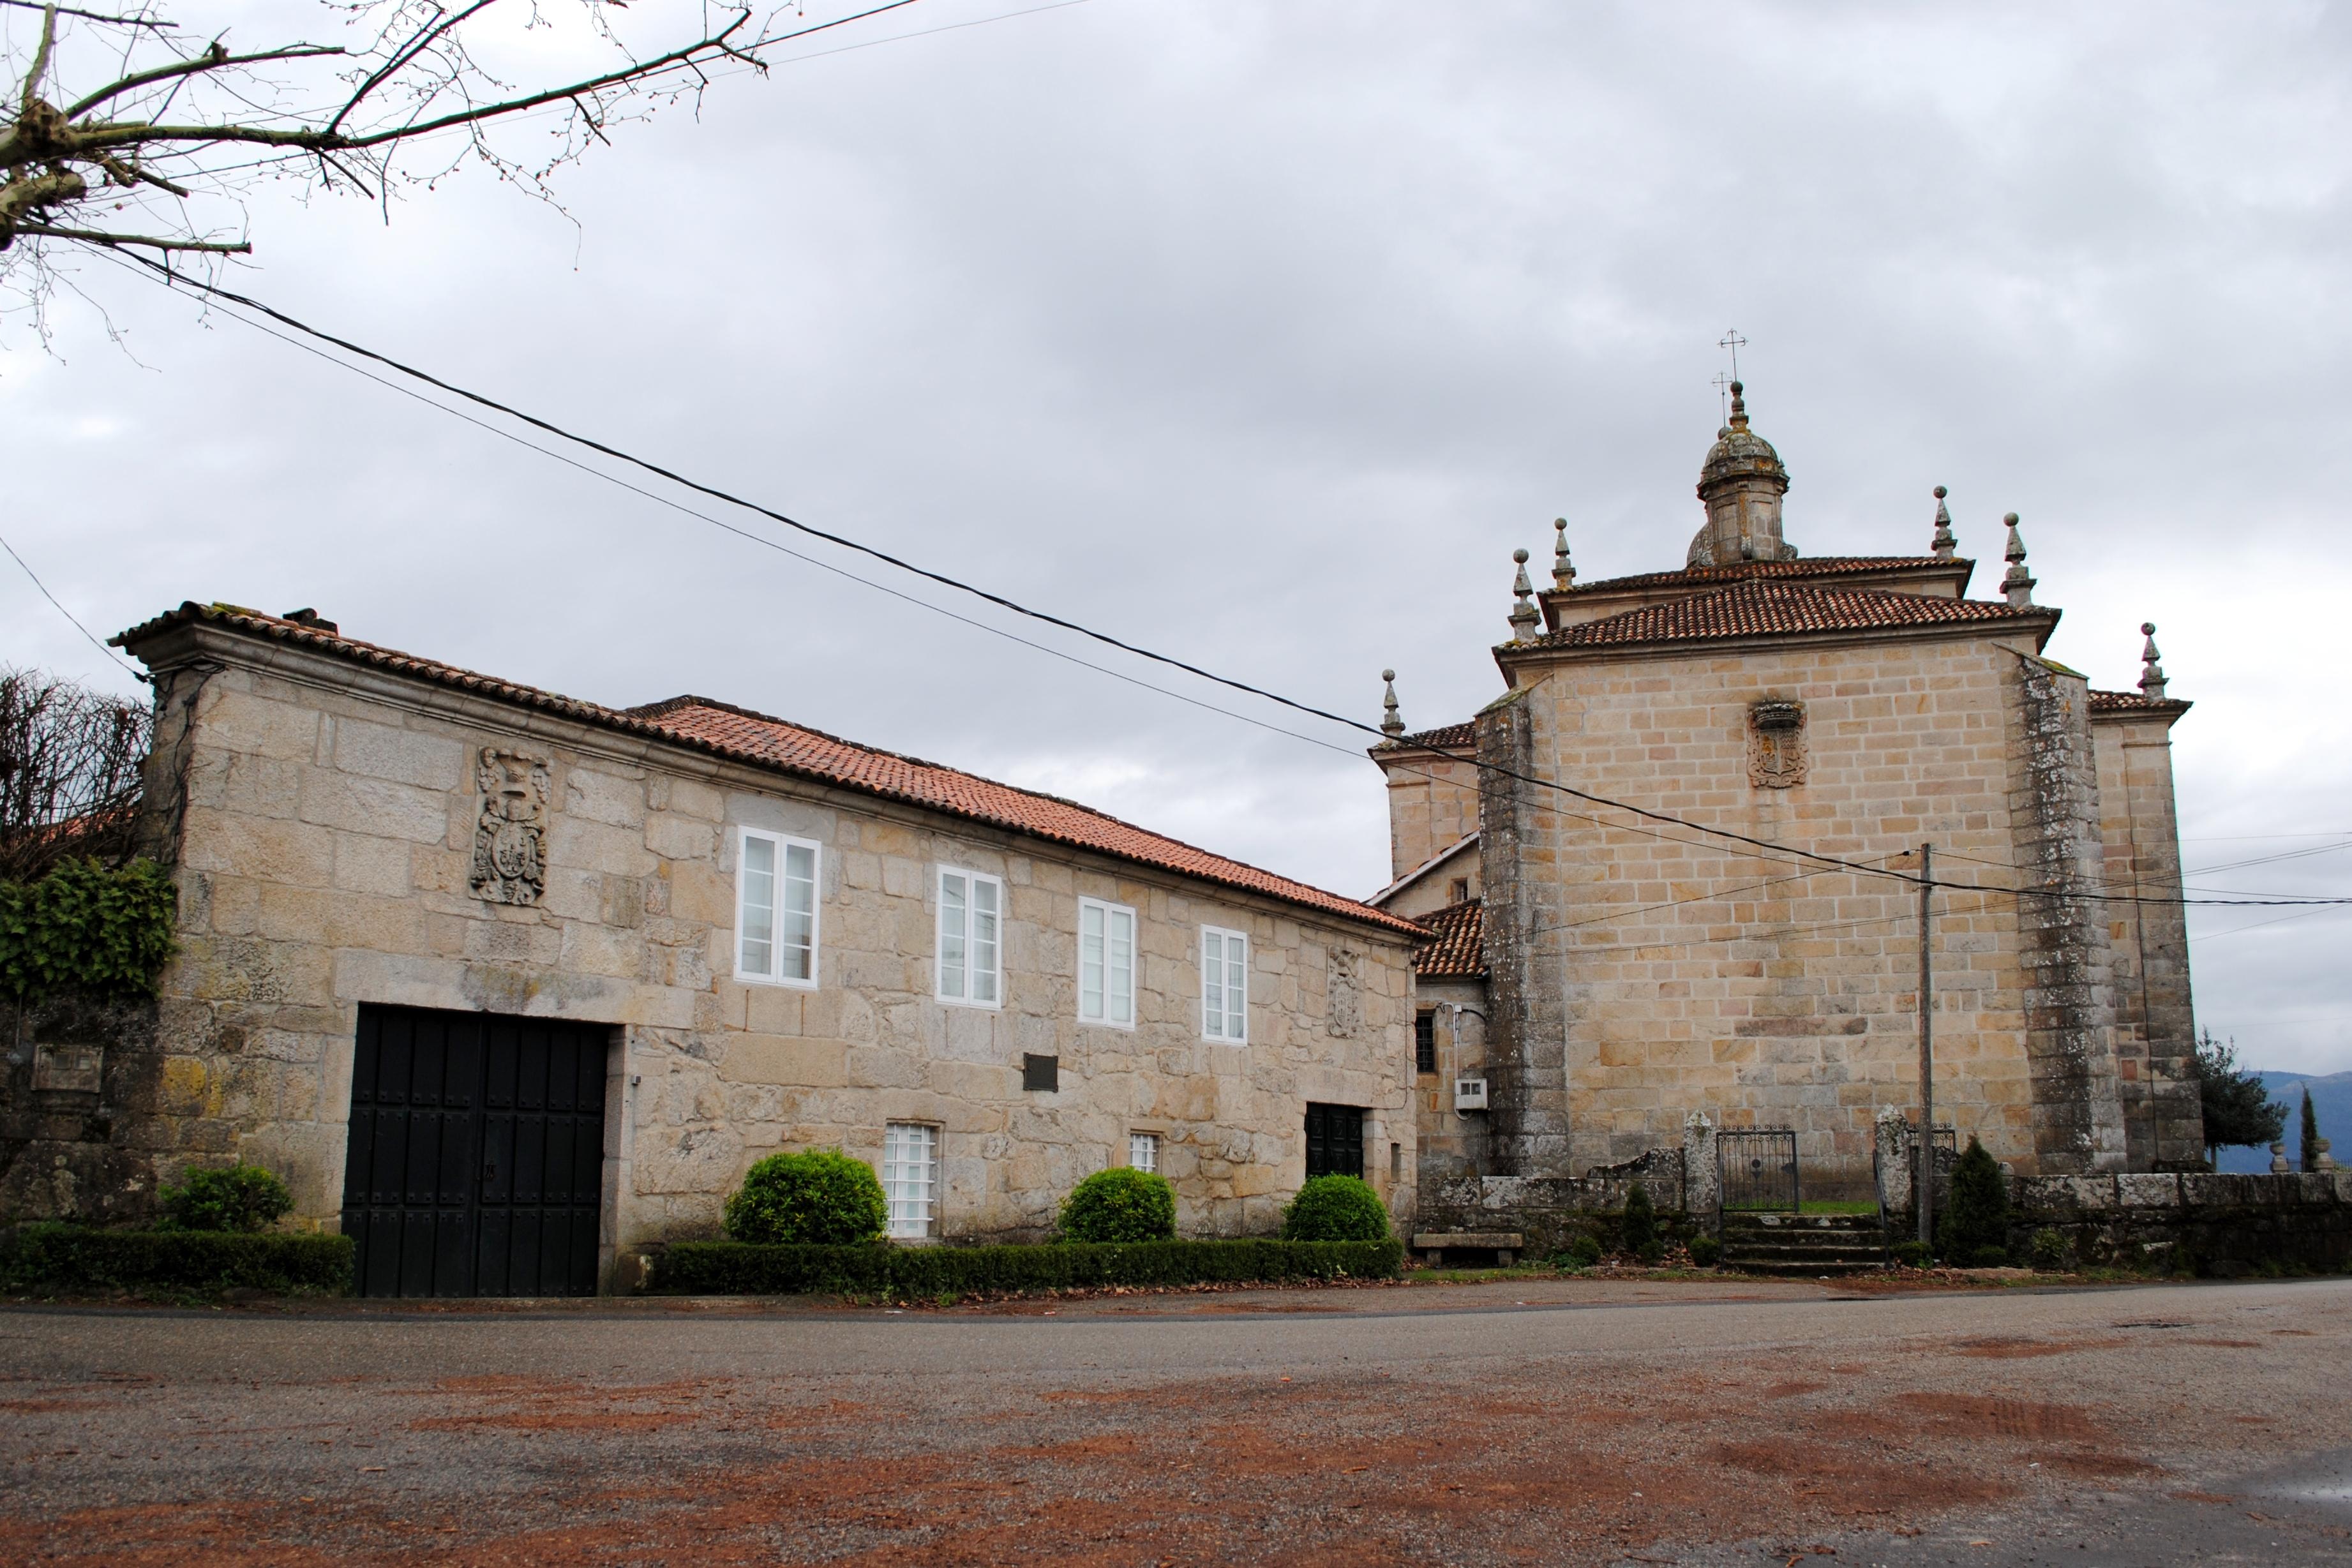 http://upload.wikimedia.org/wikipedia/commons/9/93/Pazo_e_igrexa_de_Reboreda%2C_Redondela.jpg